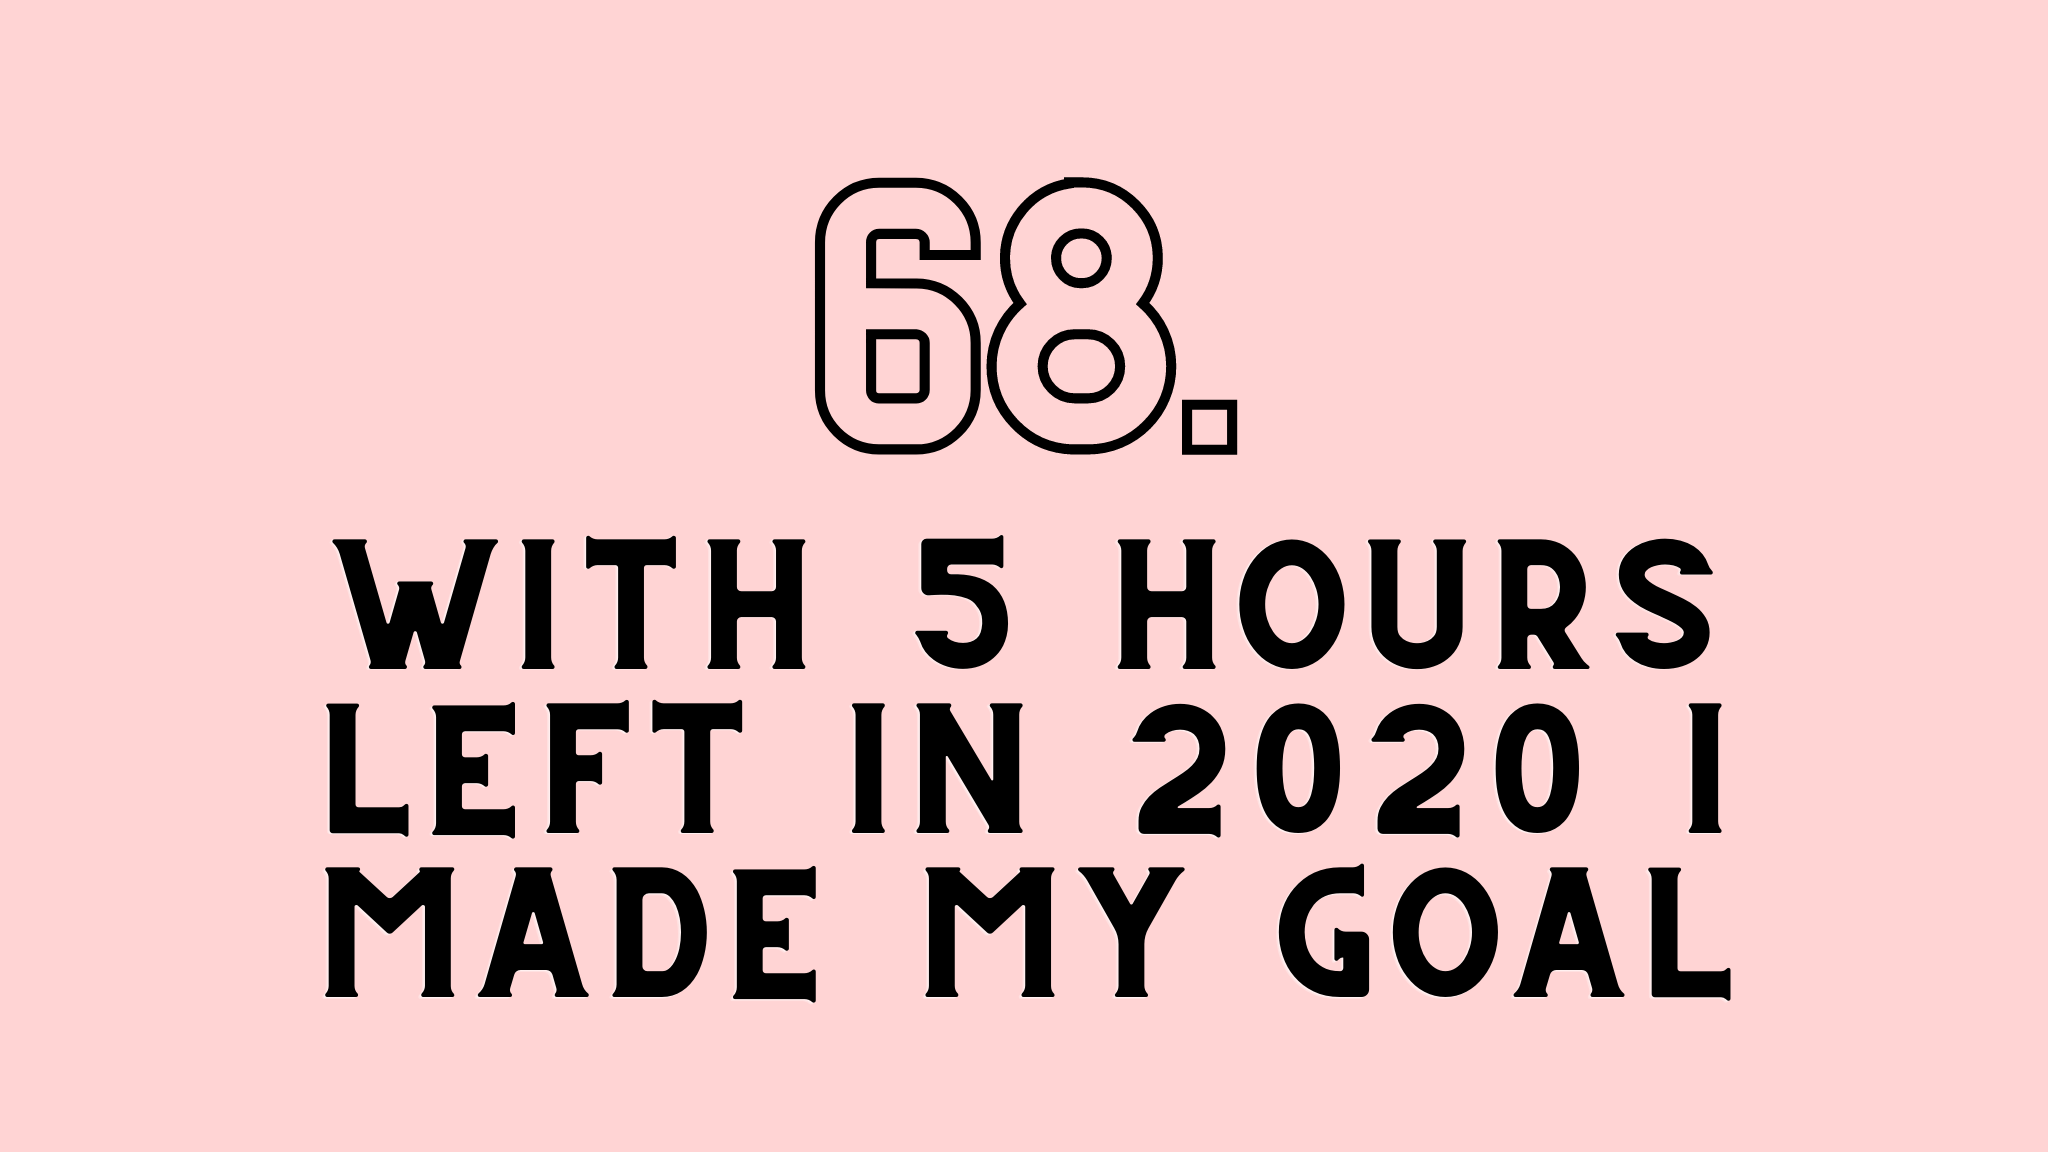 i made my goal